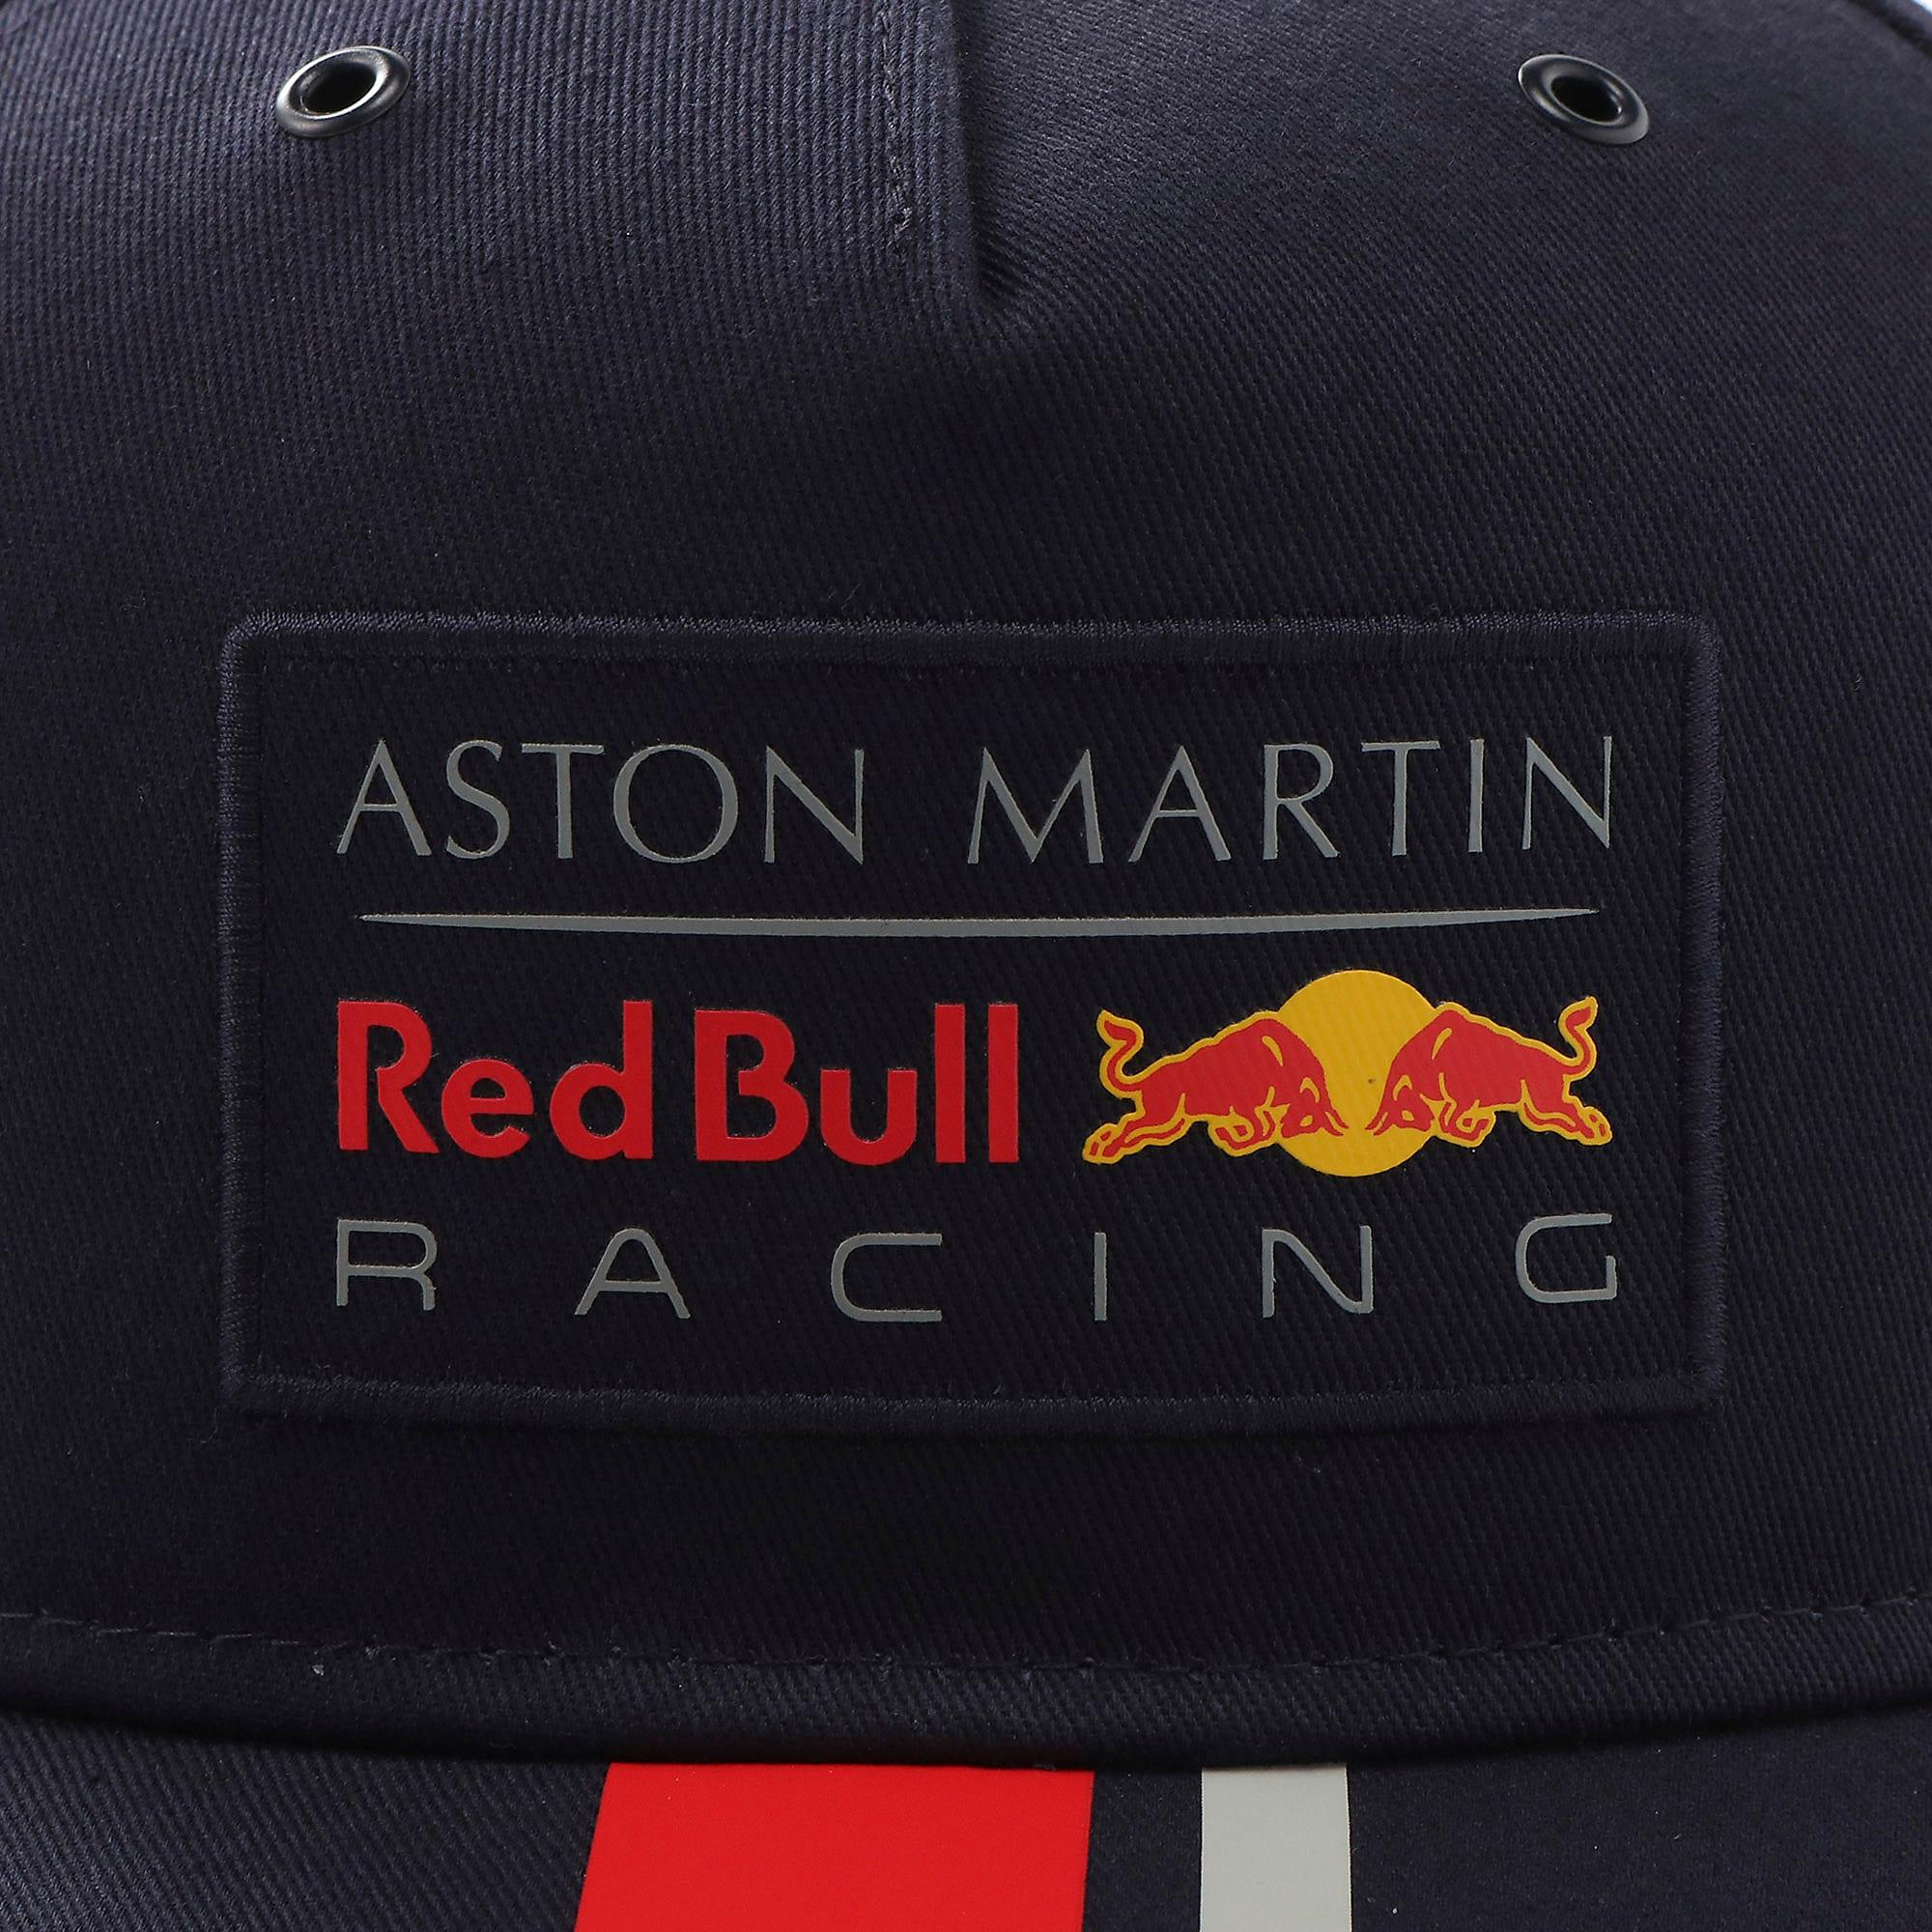 Thumbnail 6 of ASTON MARTIN RED BULL RACING レプリカ ガスリー FB キャップ, NIGHT SKY-Chinese Red, medium-JPN